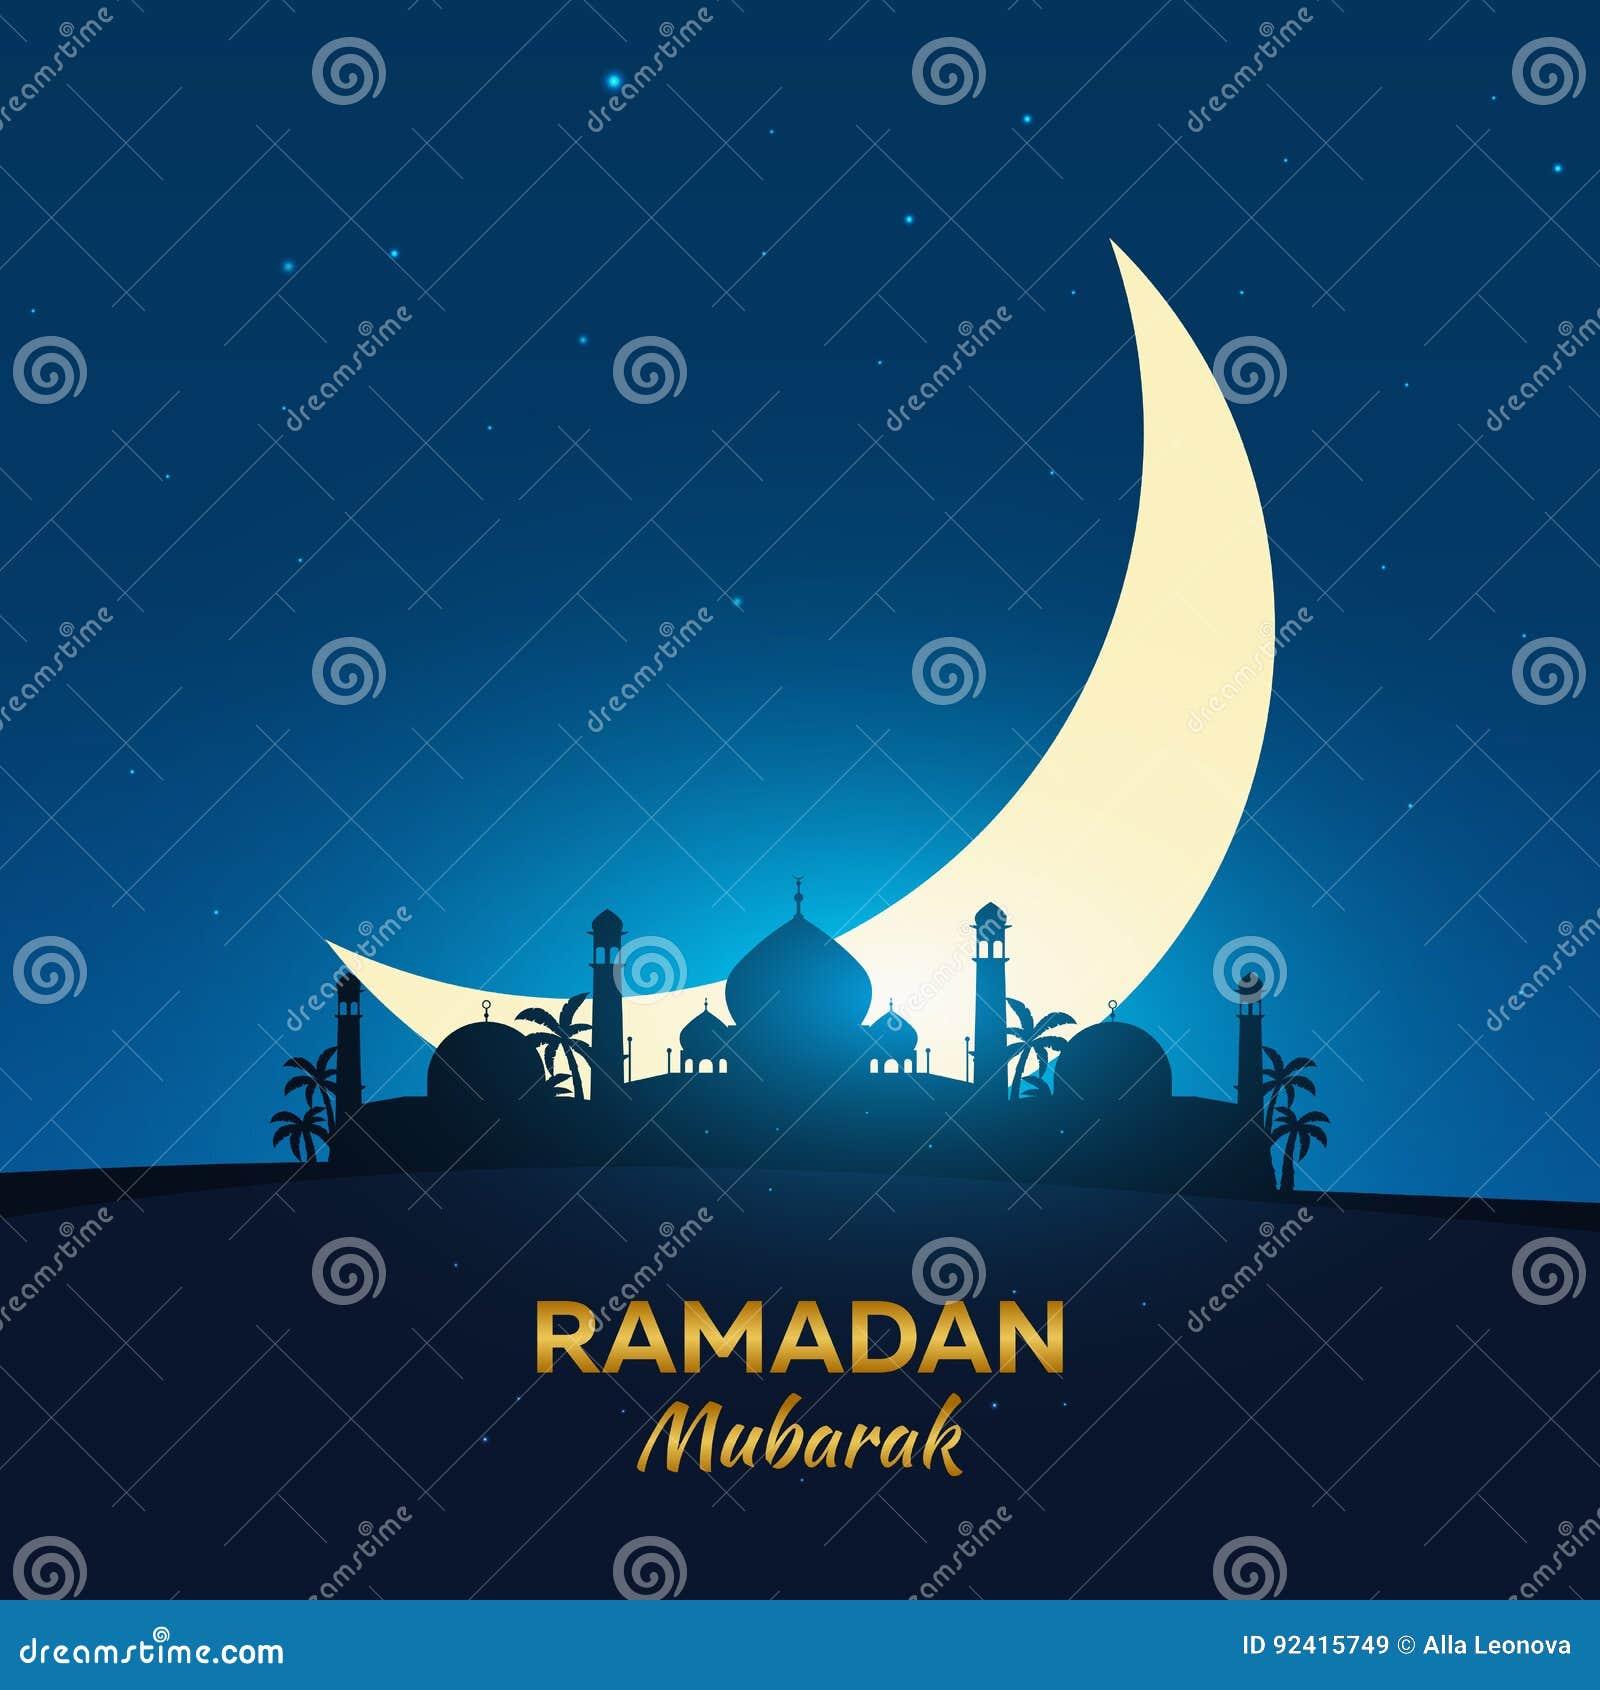 Ramadan kareem ramadan mubarak greeting card arabian night with download ramadan kareem ramadan mubarak greeting card arabian night with crescent moon m4hsunfo